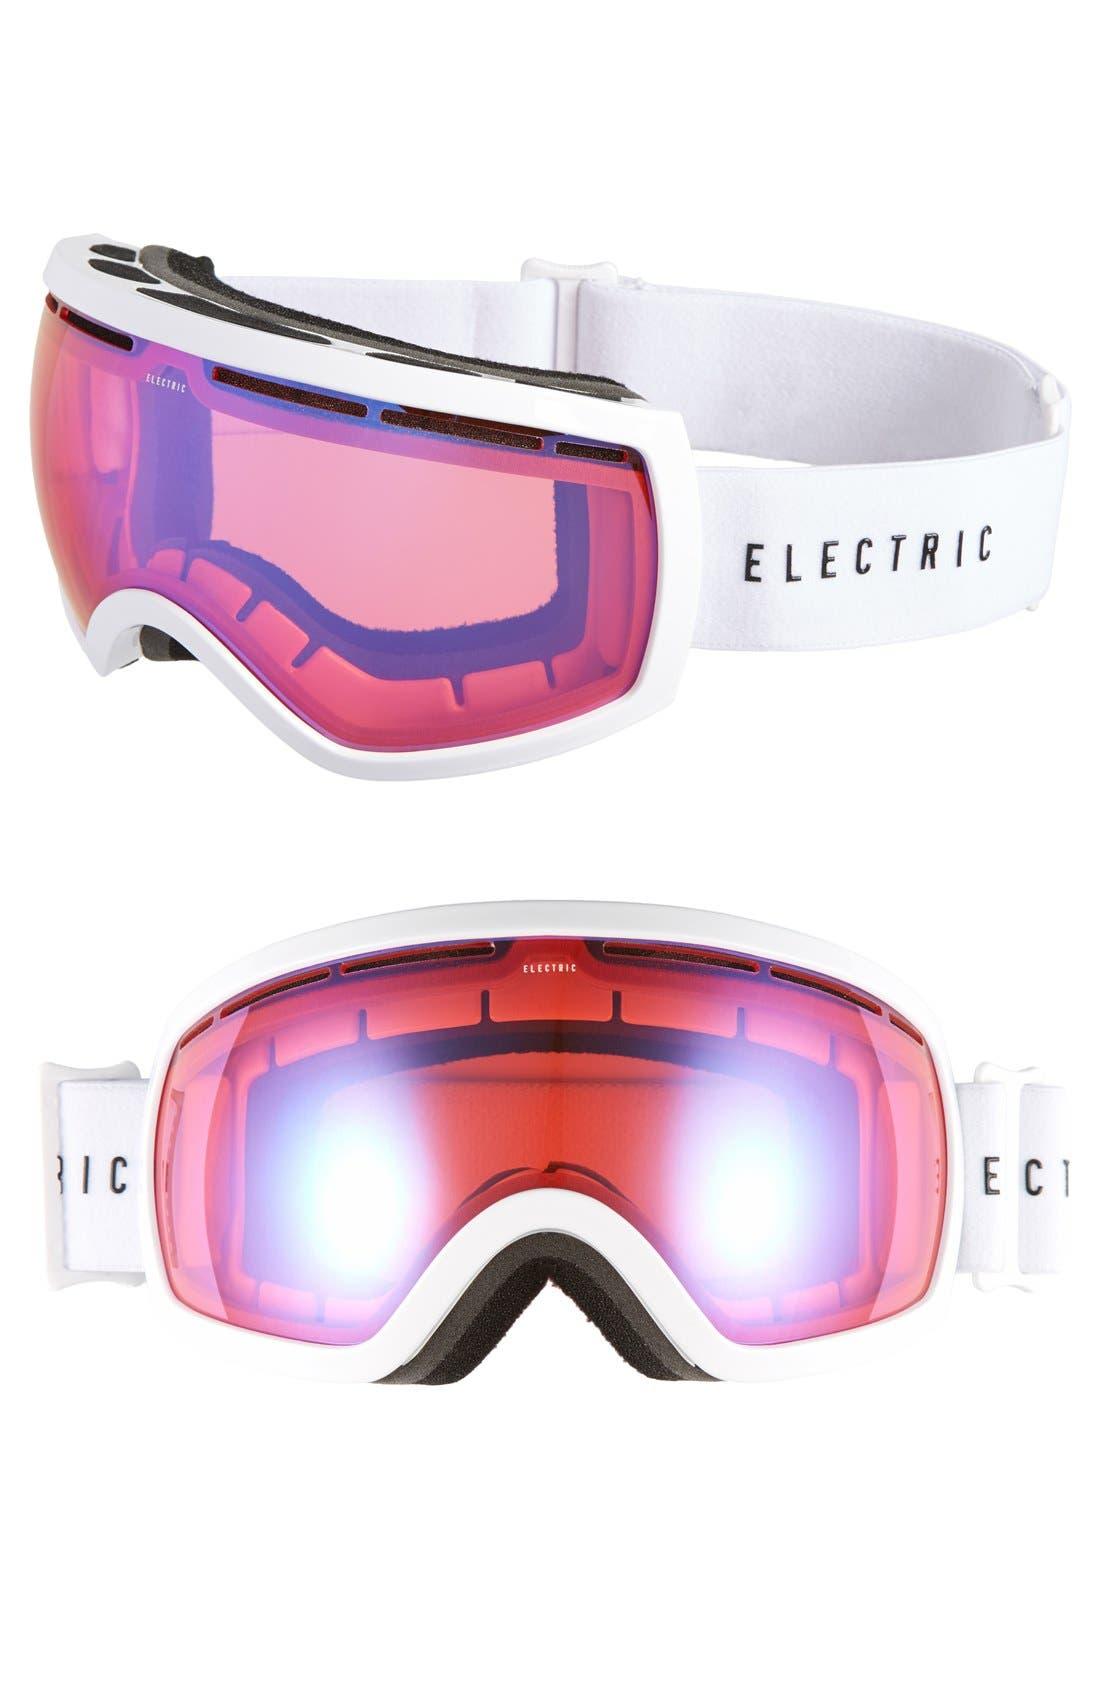 EG 2.5 215mm Snow Goggles,                             Main thumbnail 3, color,